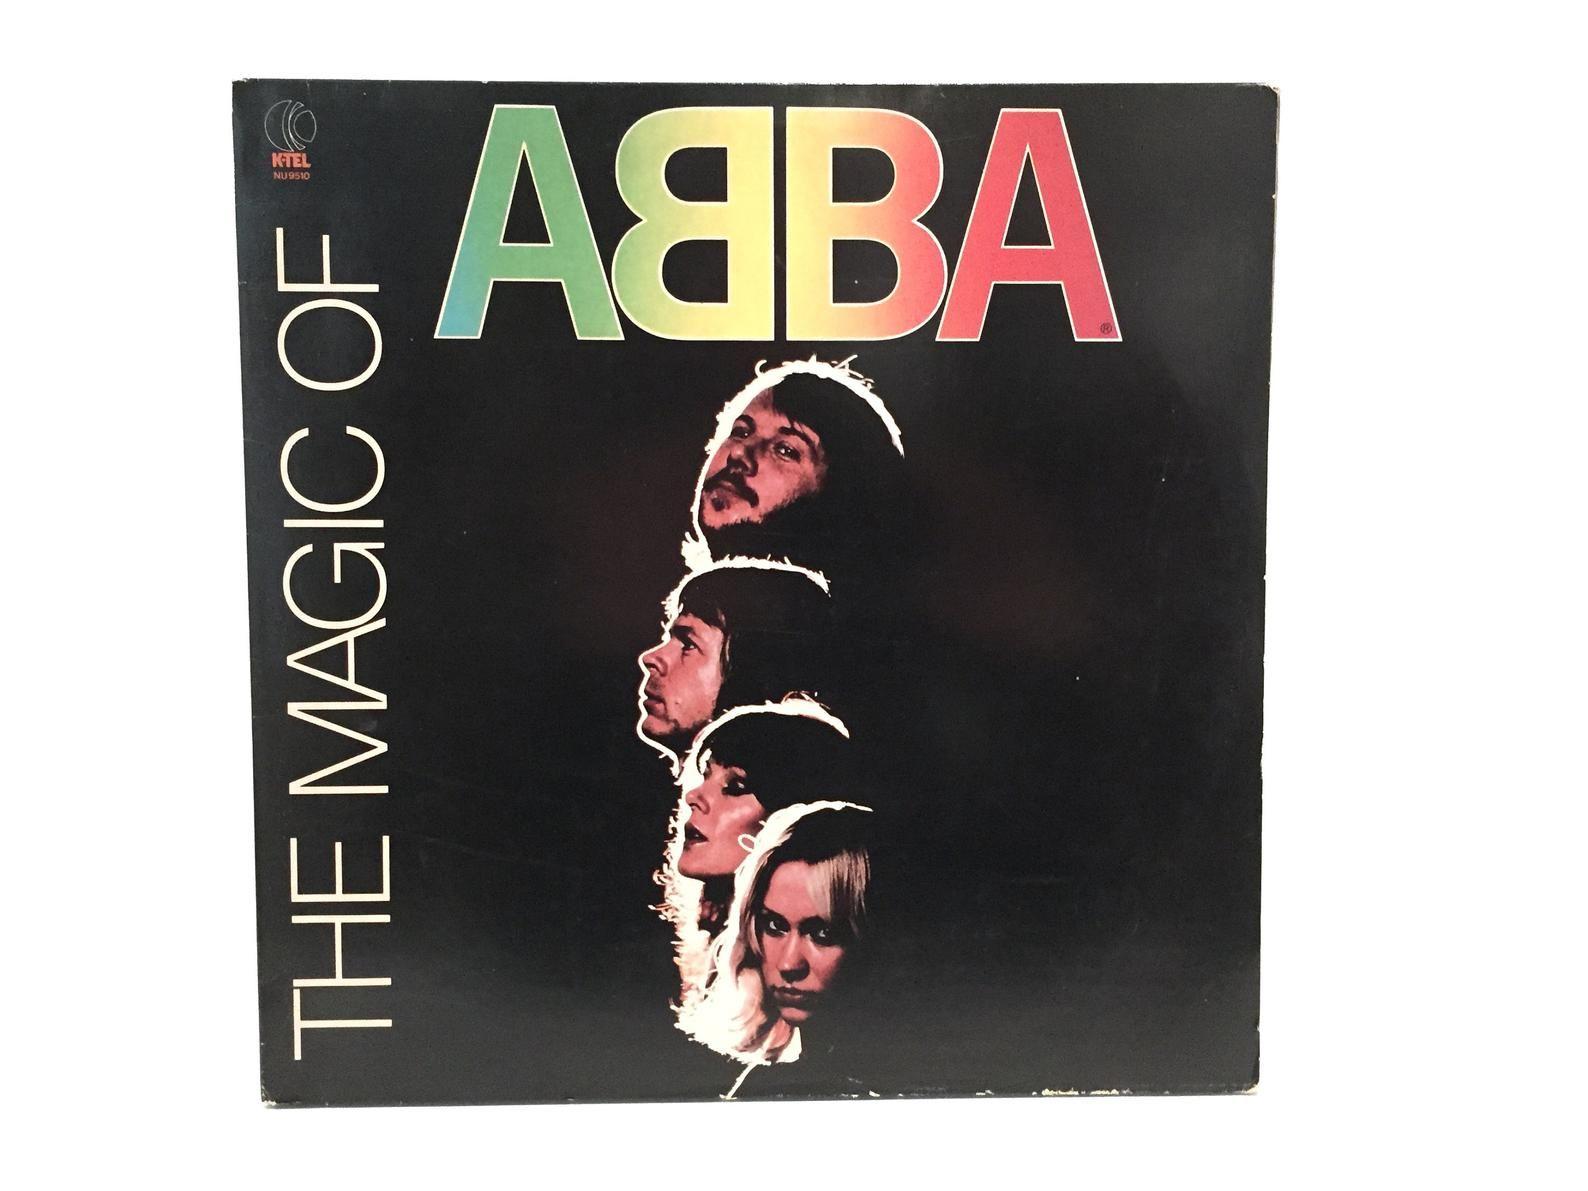 Abba The Magic Of Vintage Vinyl Record Album Greatest Hits 1980